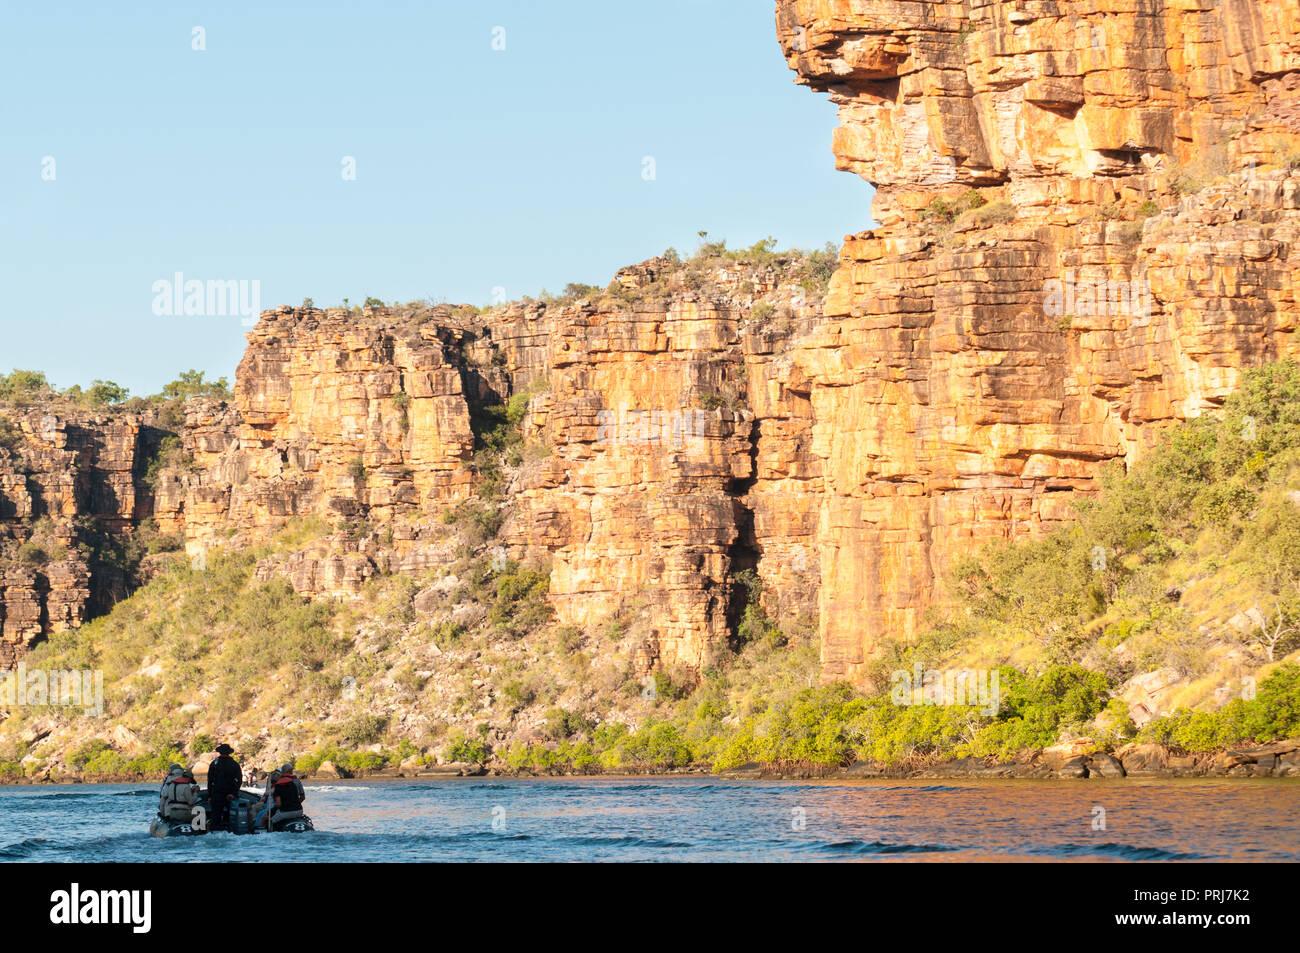 Inflatable Rubber Boat cruising King George River Gorge, Kimberley Coast, Australia - Stock Image